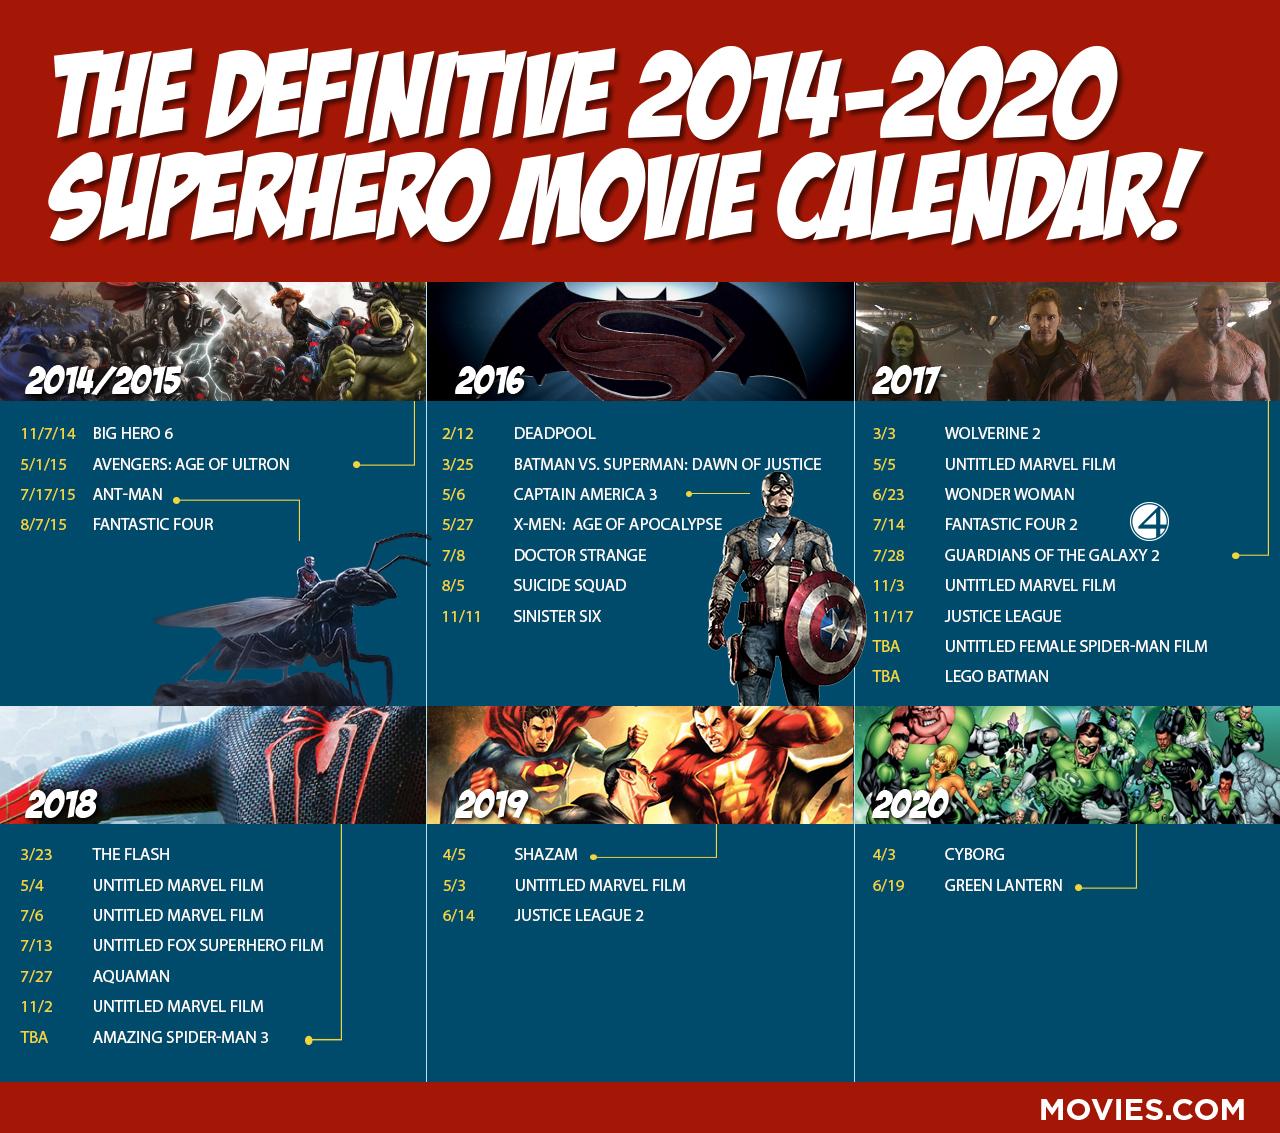 Here's Your Definitive 2014-2020 Superhero Movie Calendar...